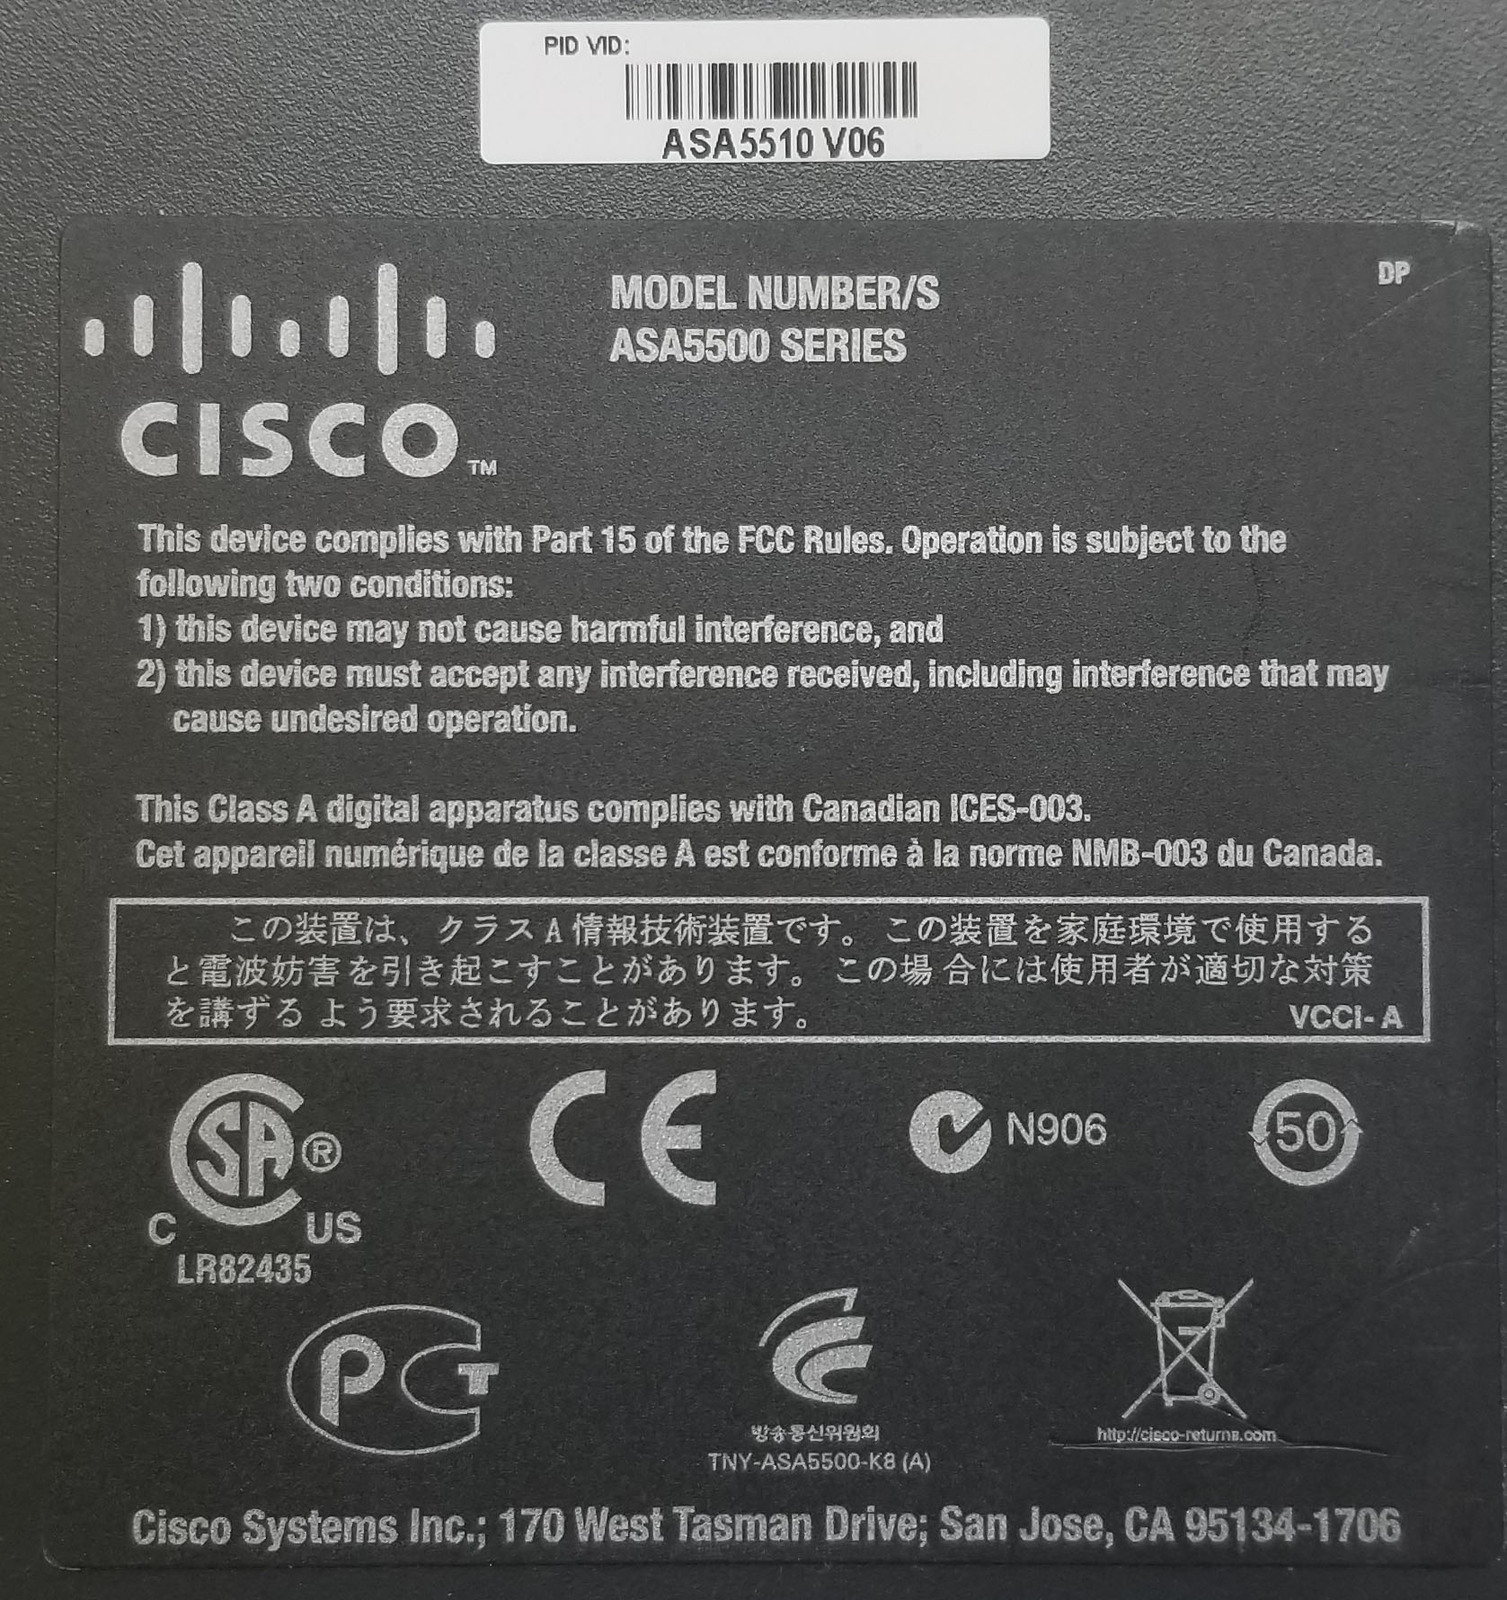 Cisco ASA 5510 Series Adaptive Security Appliance Bin:3